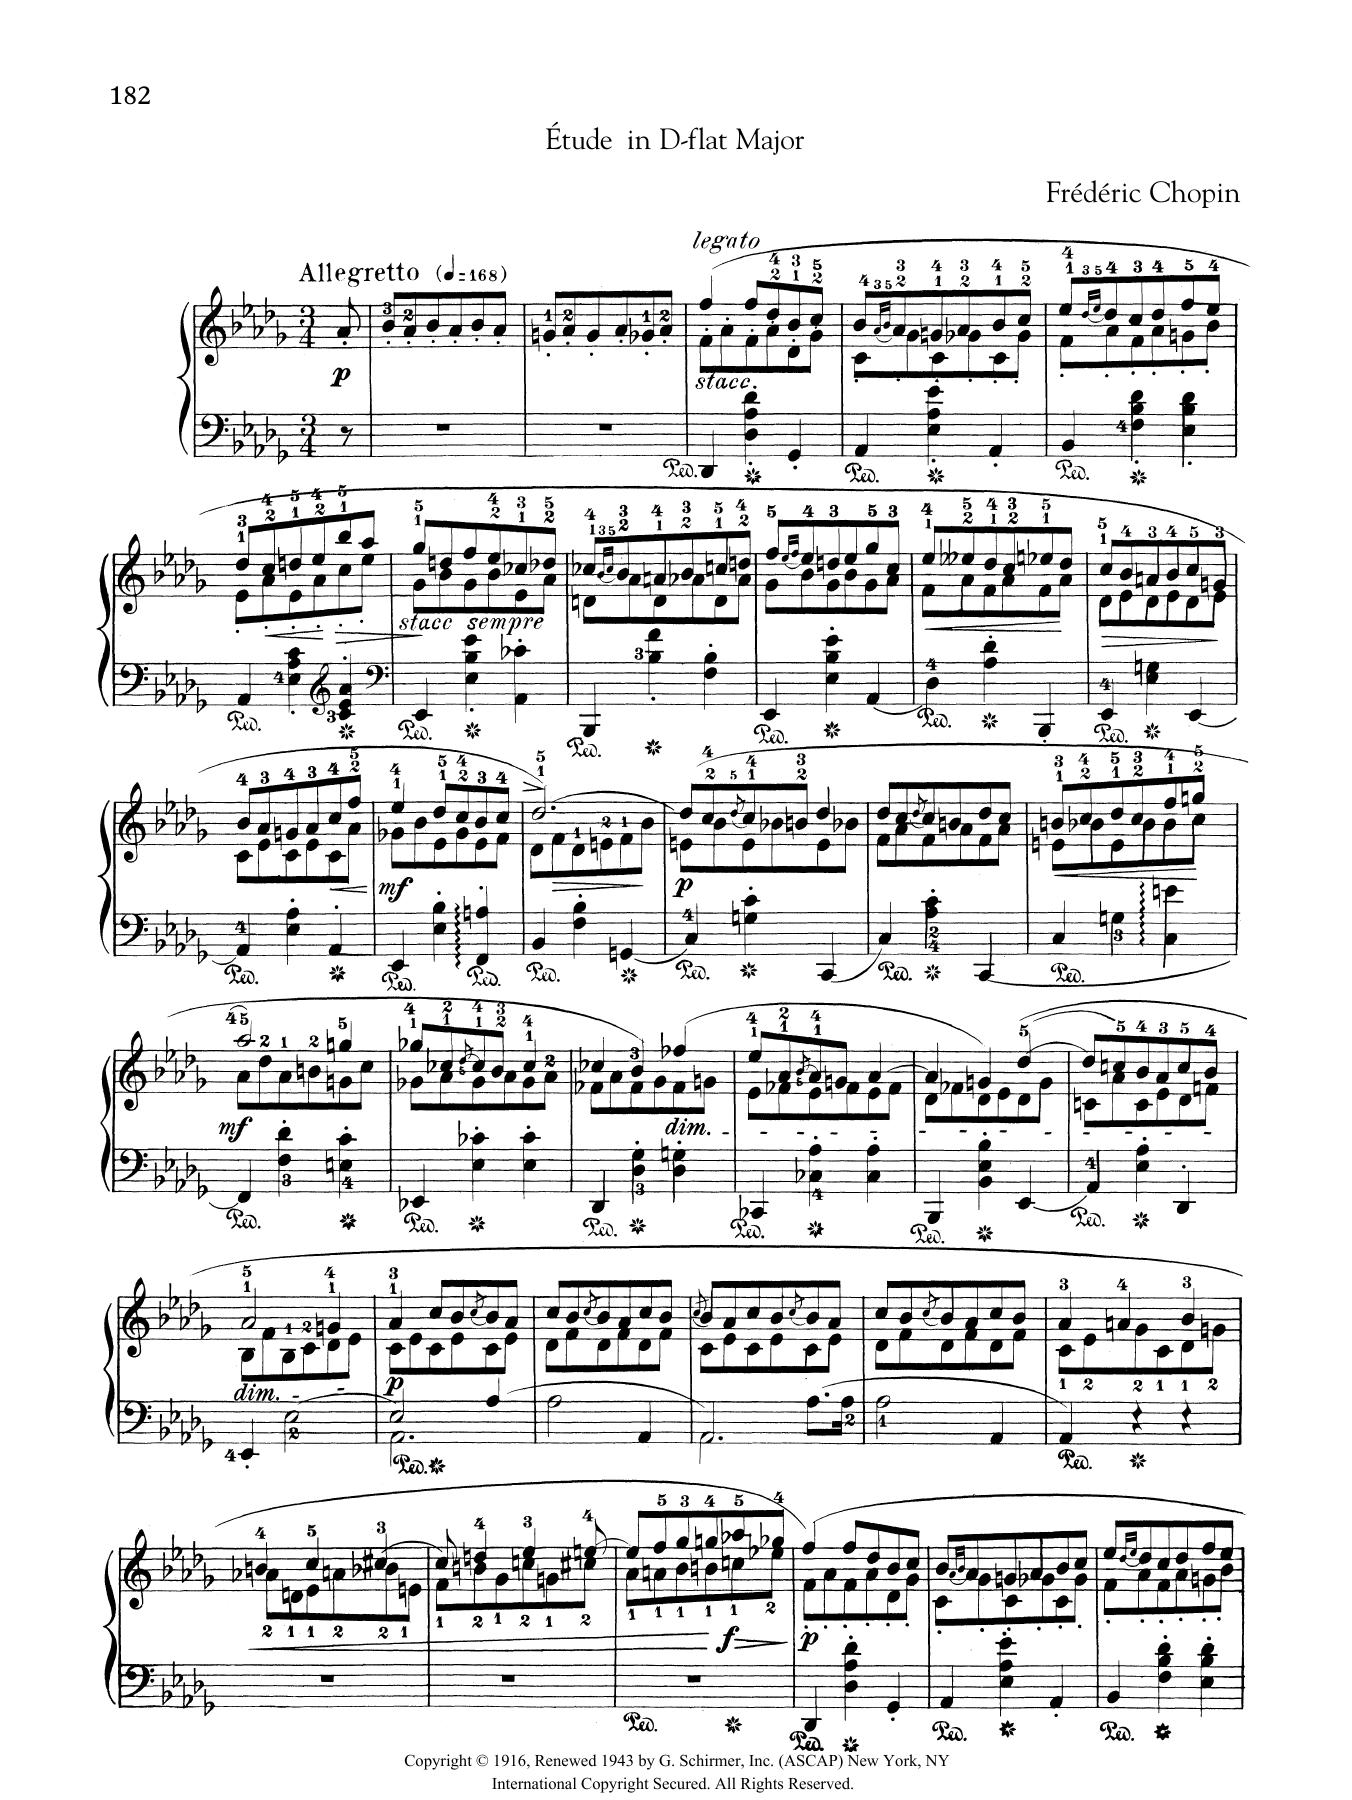 Etude in D-flat Major, from Trois Nouvelles Etudes from Methode des methodes de piano Sheet Music